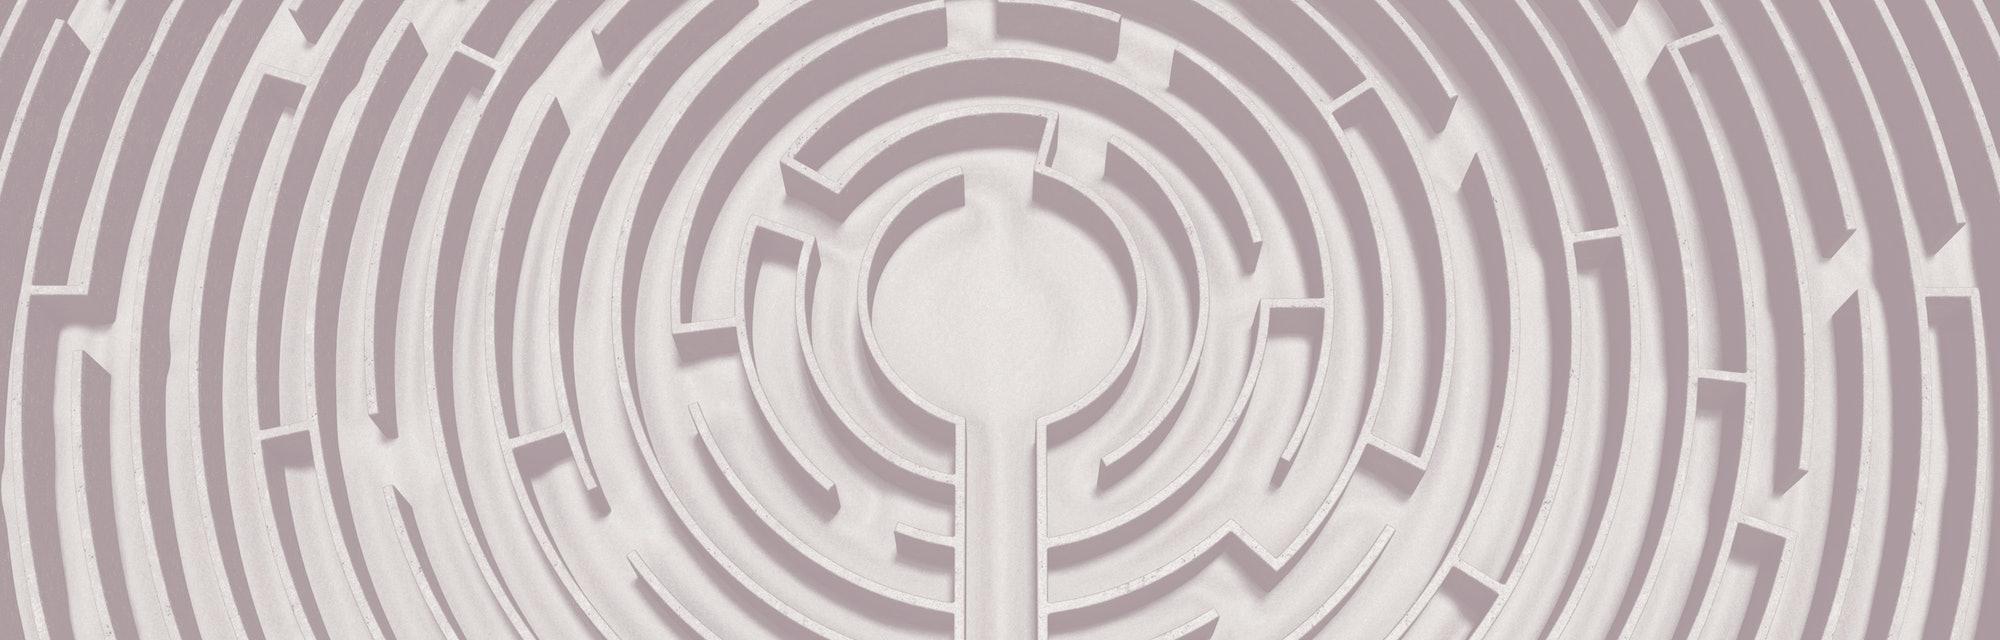 maze, memory